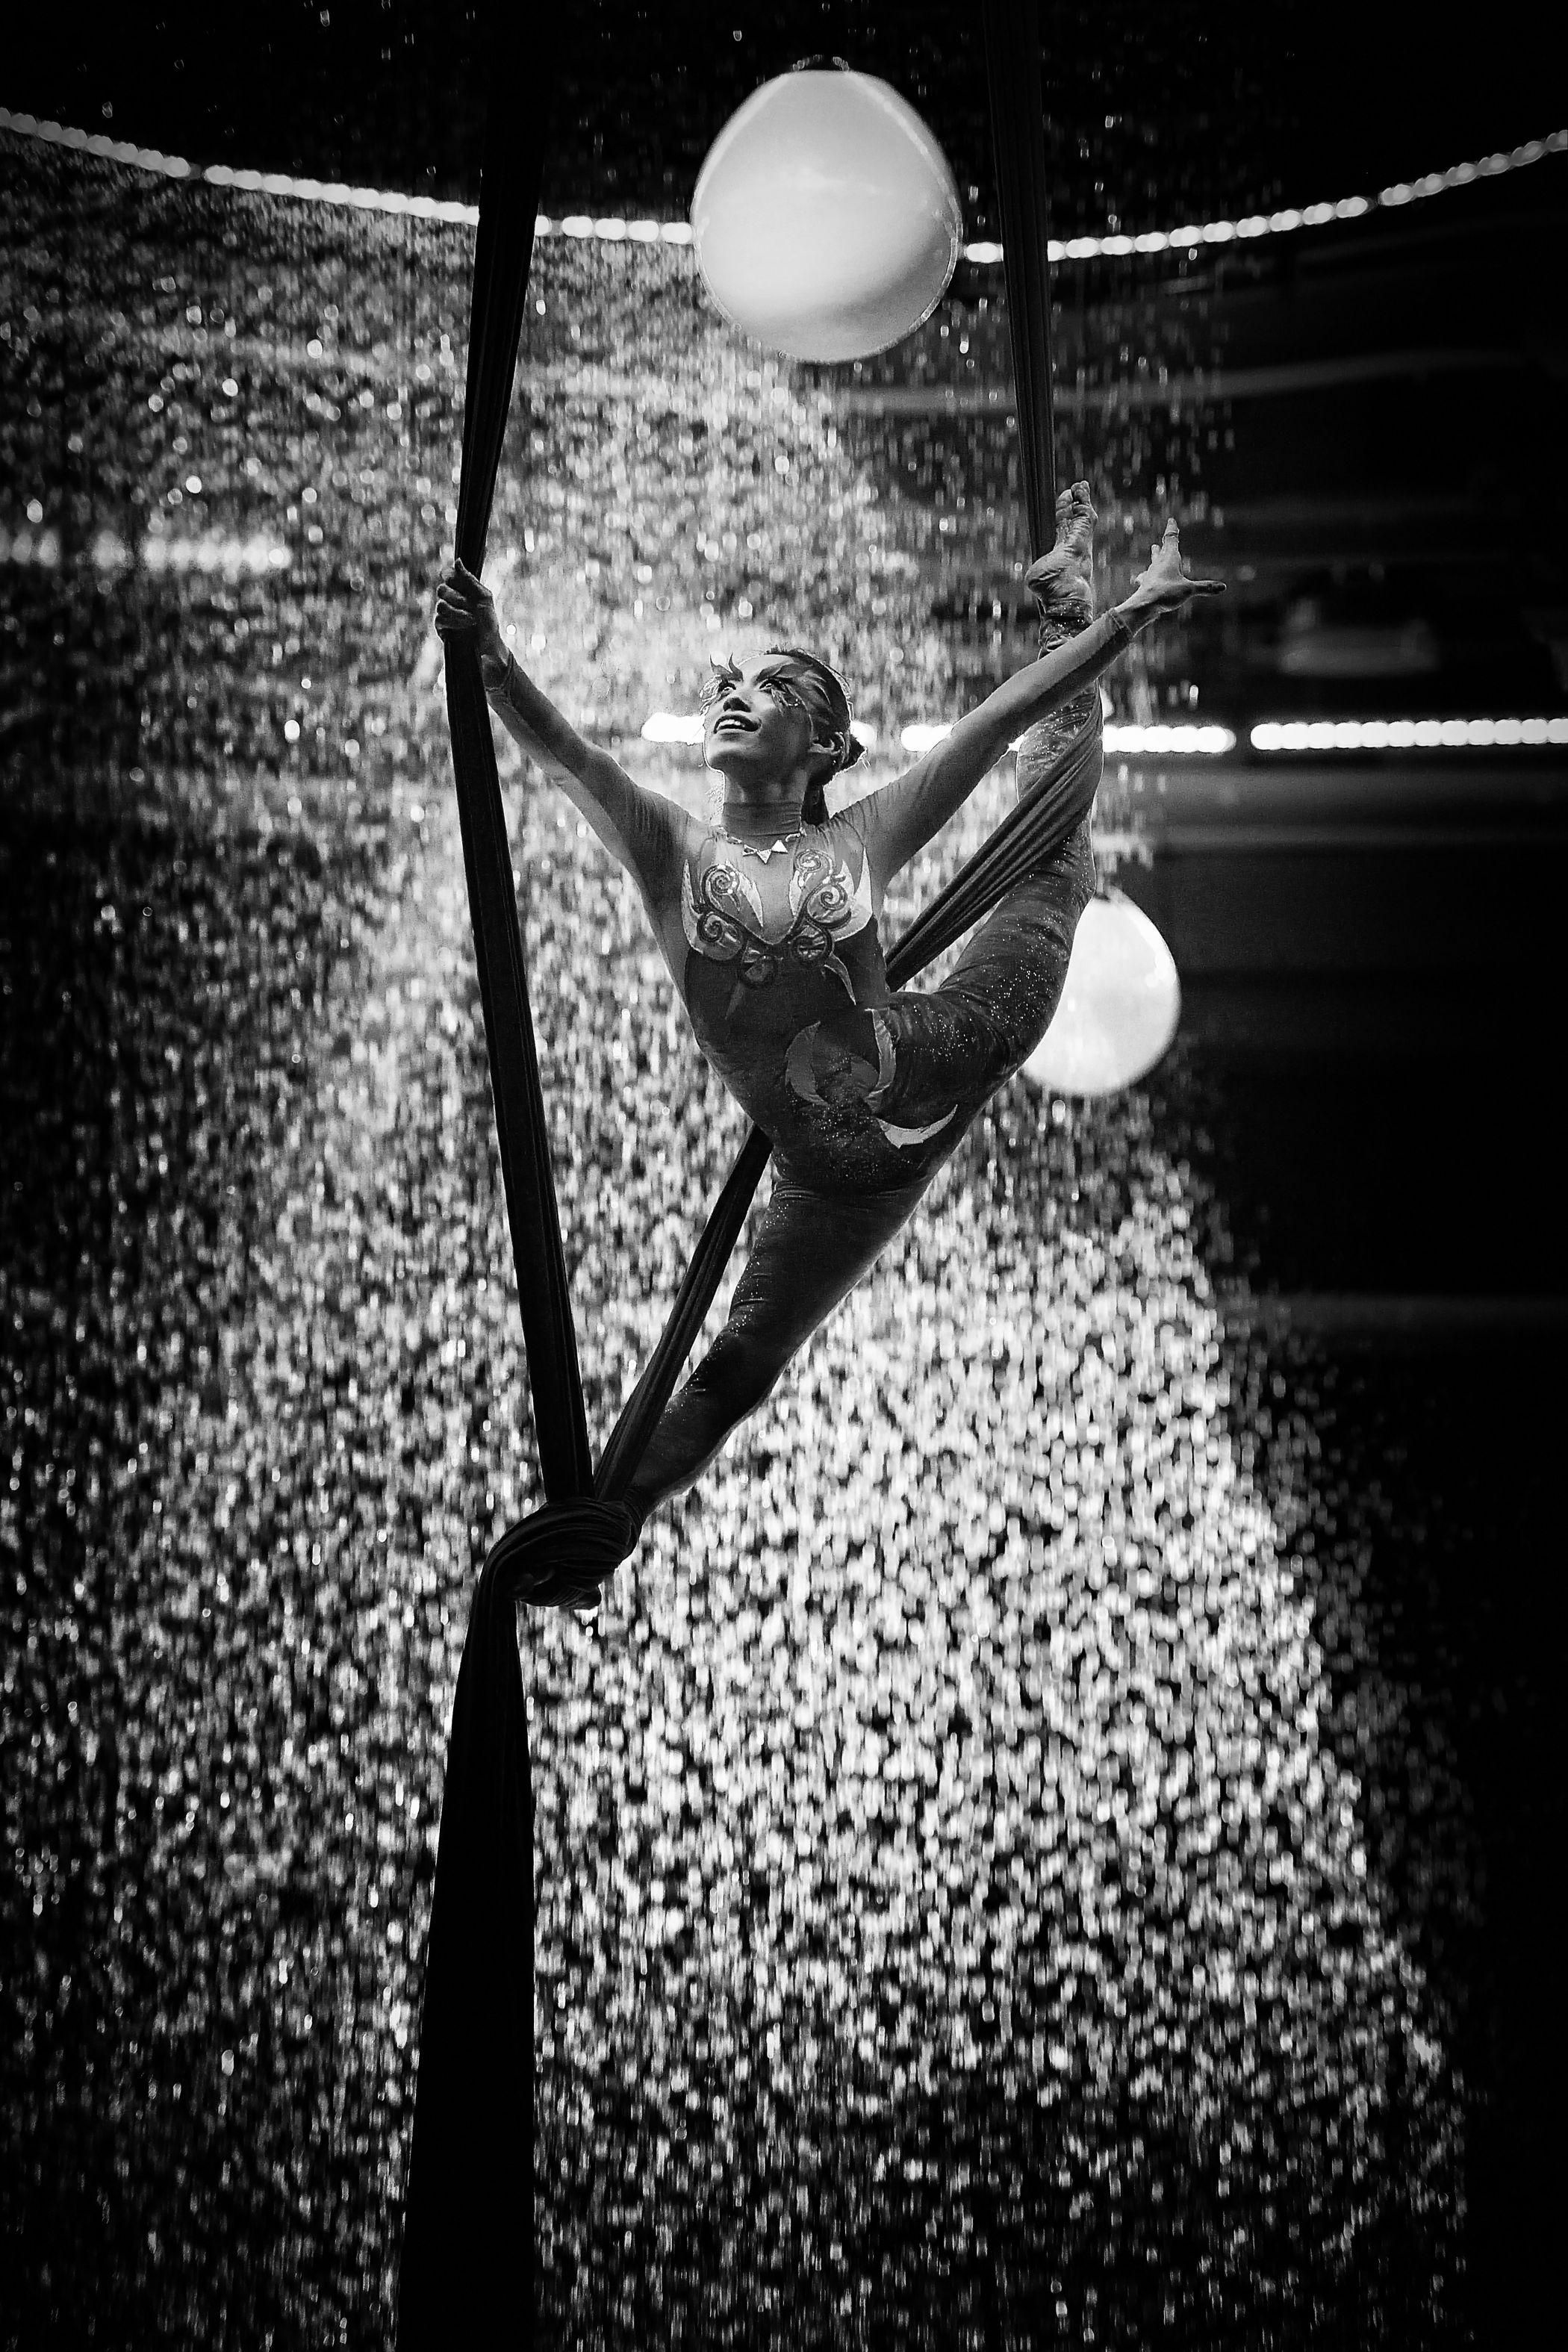 Aerial Silk Ball Blackandwhite Circus Cirque Dancer Eye4photography  EyeEm EyeEm Best Shots EyeEm Gallery Light And Shadow Monochrome Sport Trip Water